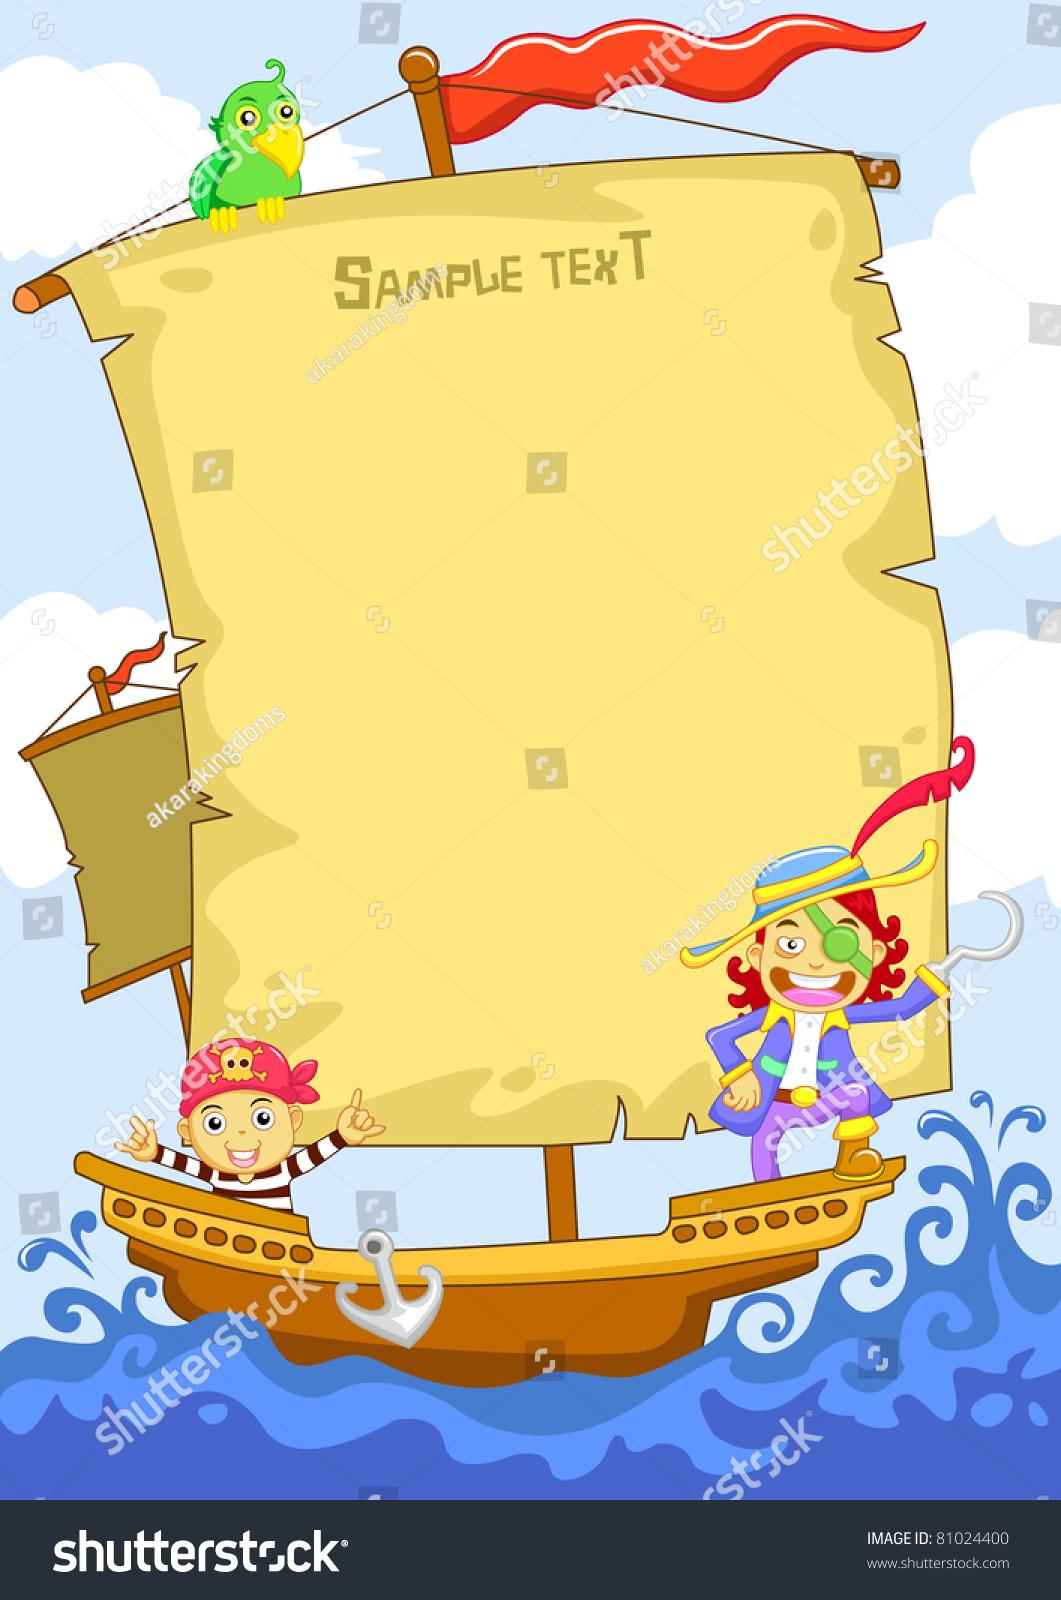 Happy Pirate Cartoon Frame Stock Vector (2018) 81024400 - Shutterstock